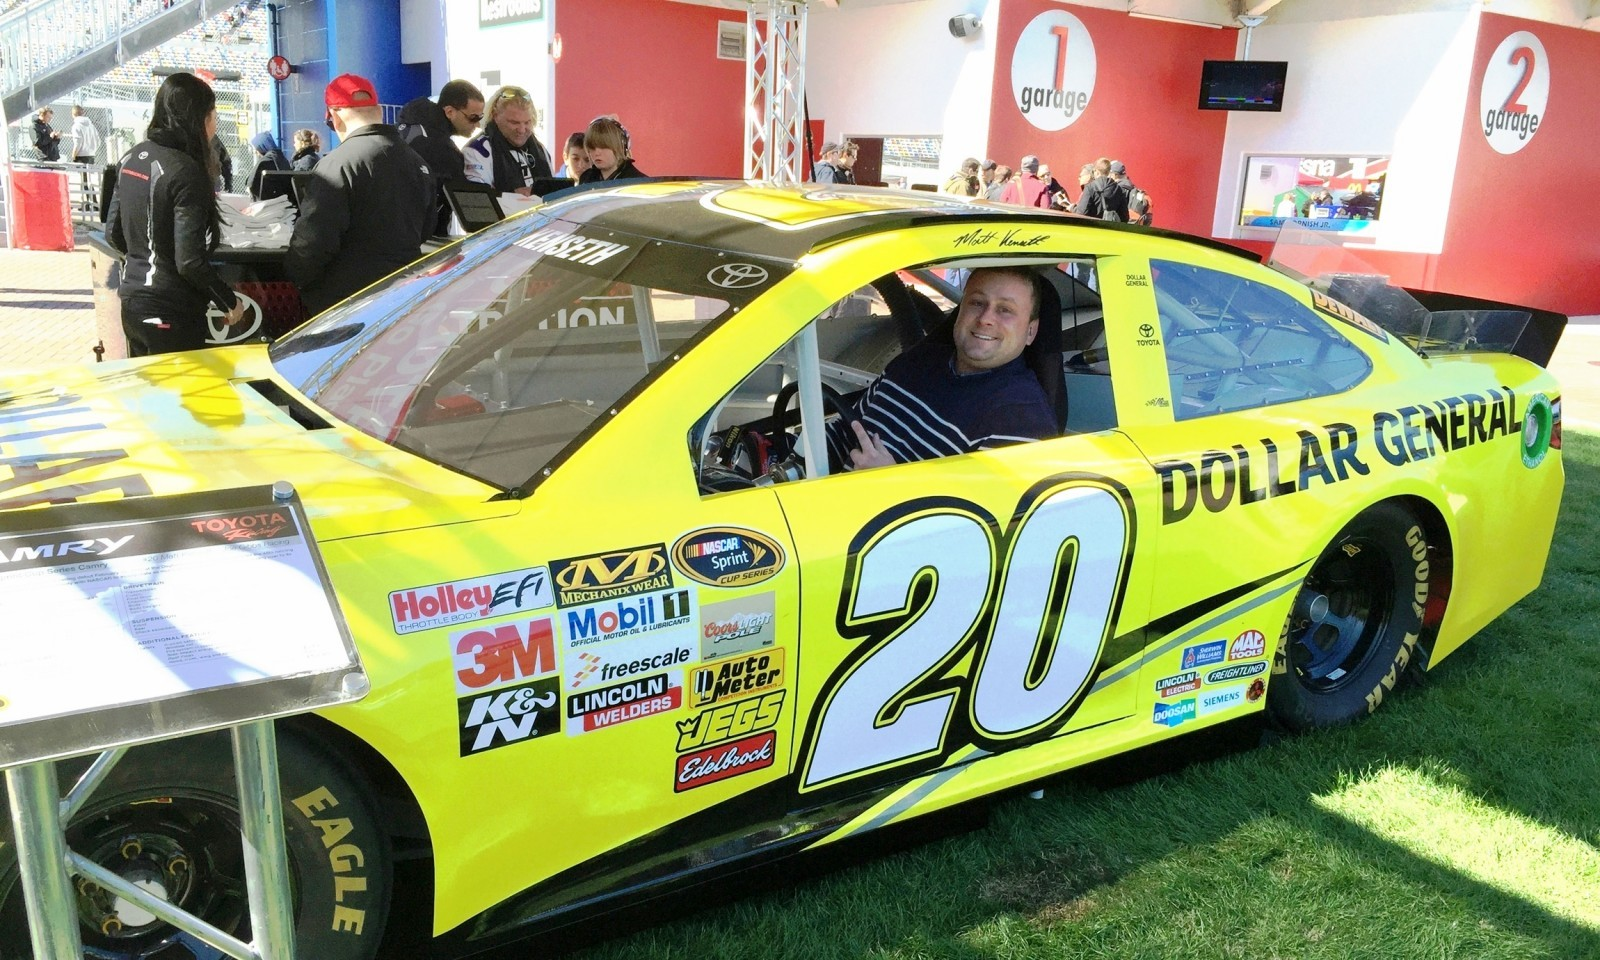 2015 Toyota Camry NASCAR Dollar General 9